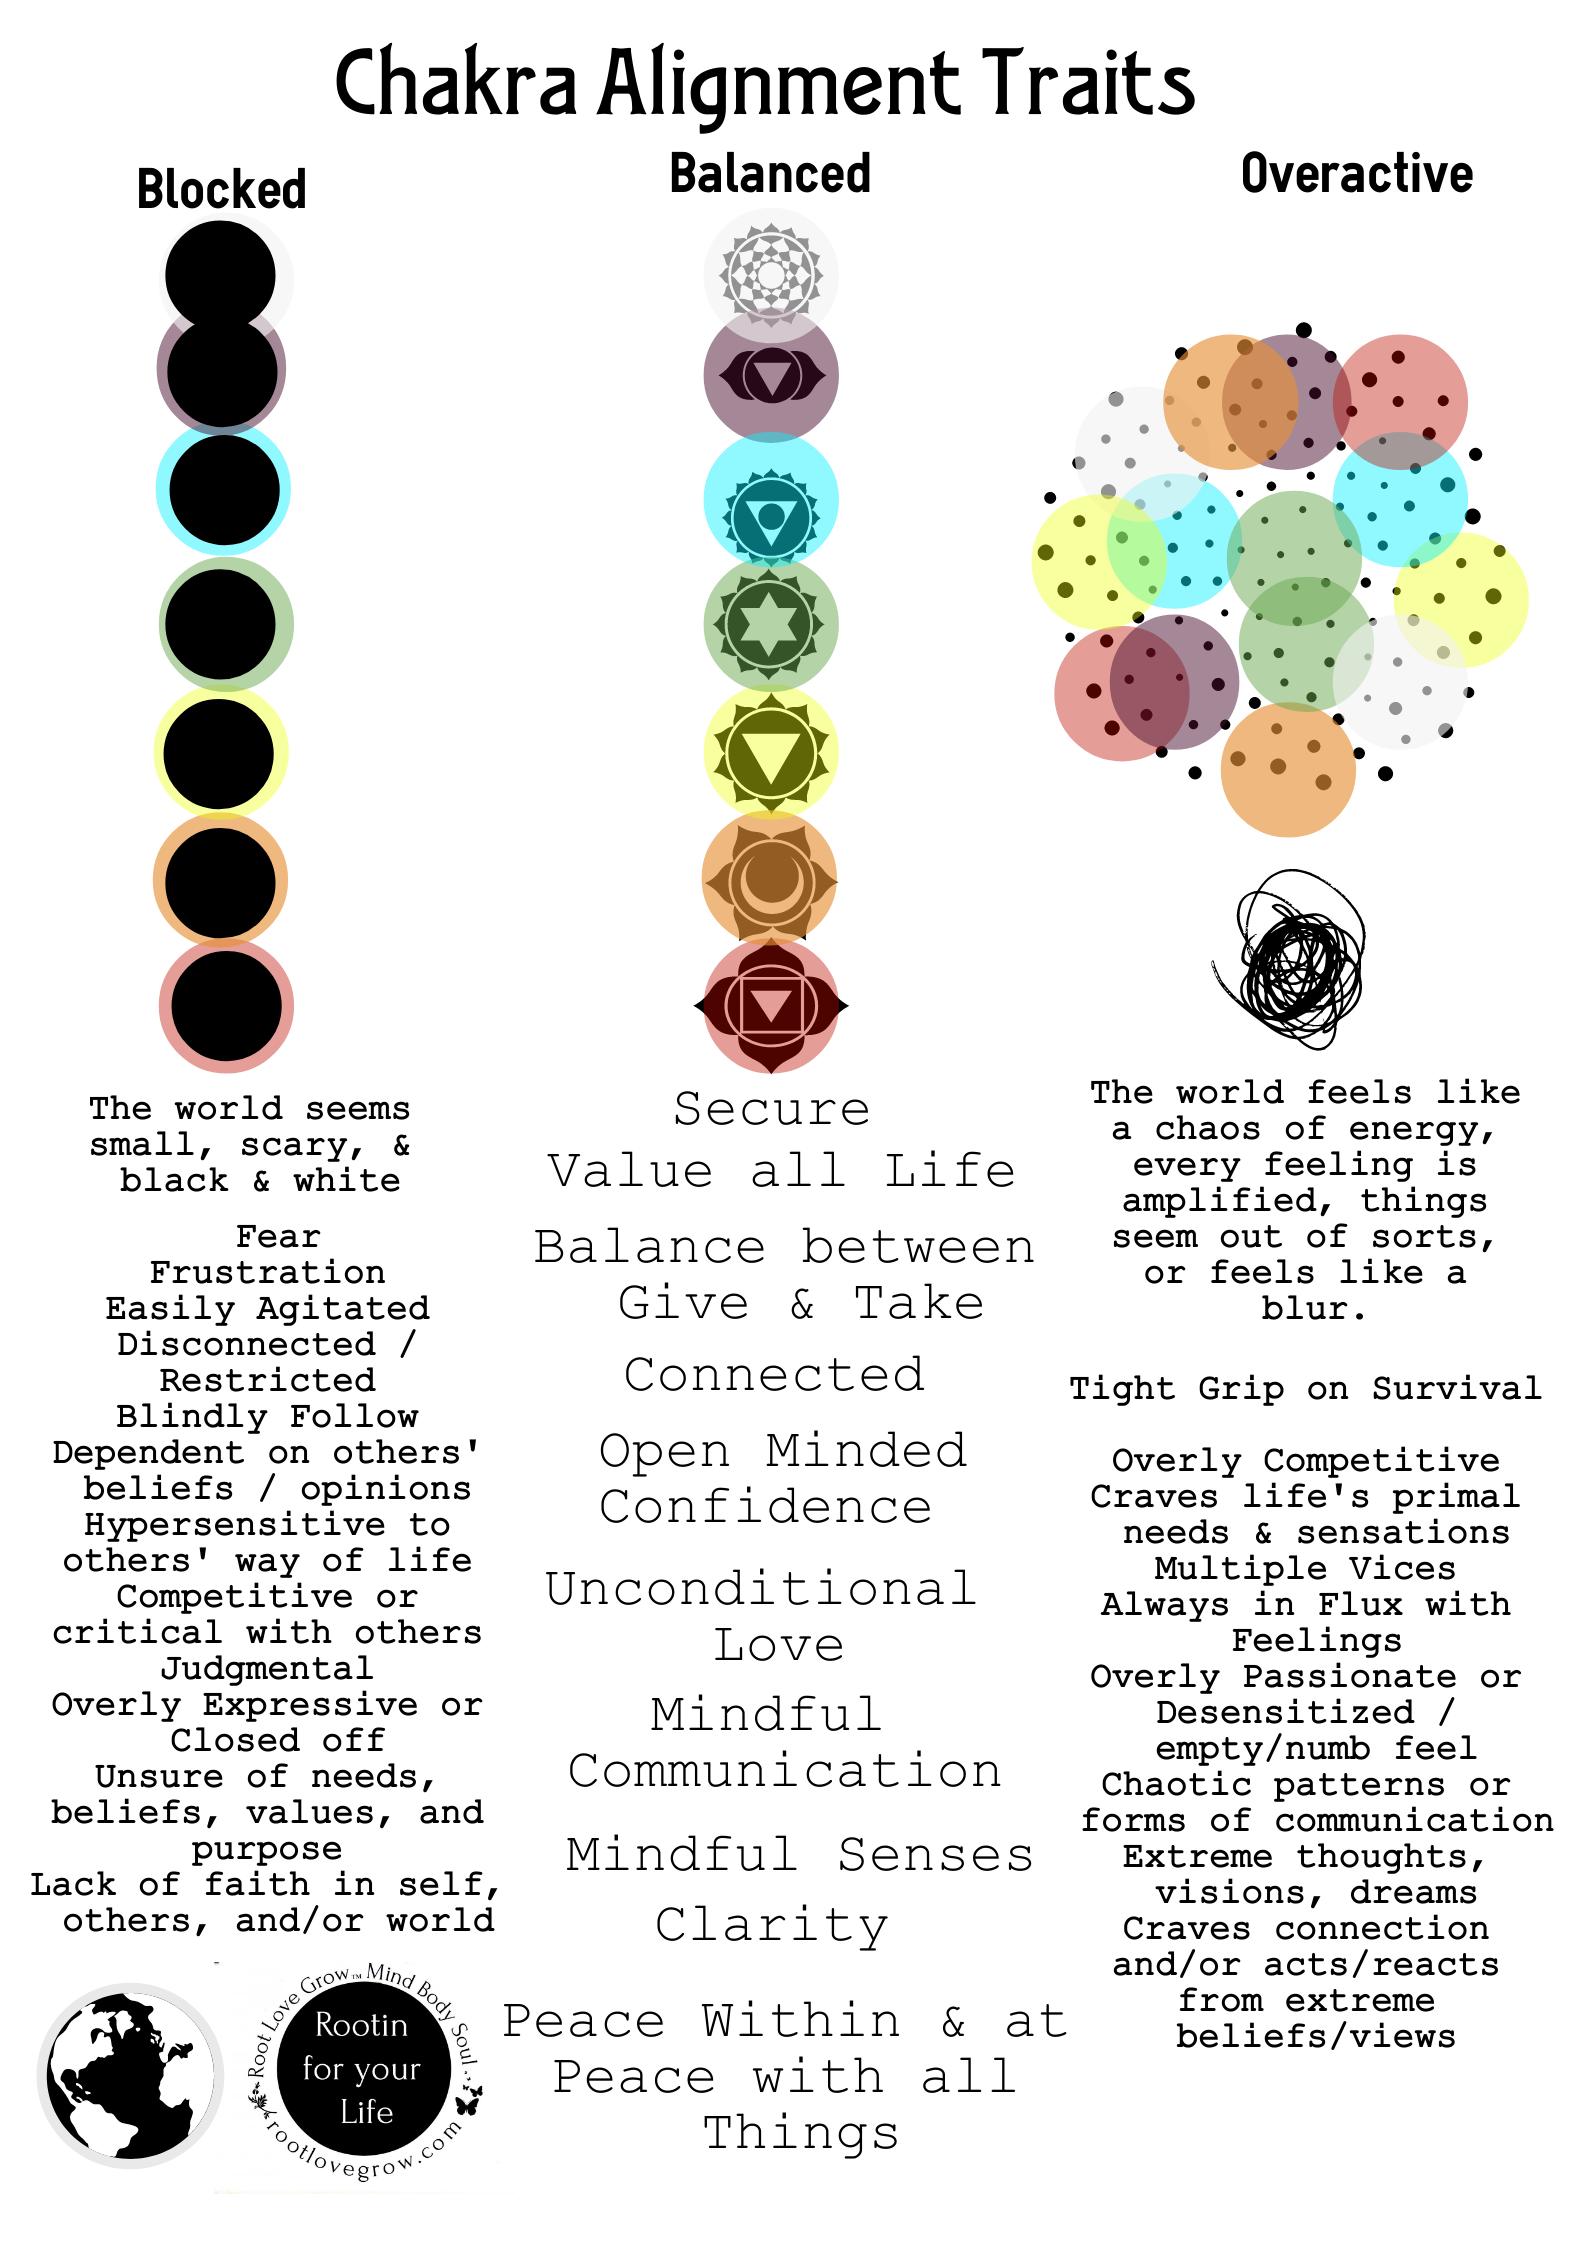 chakra align traits.png